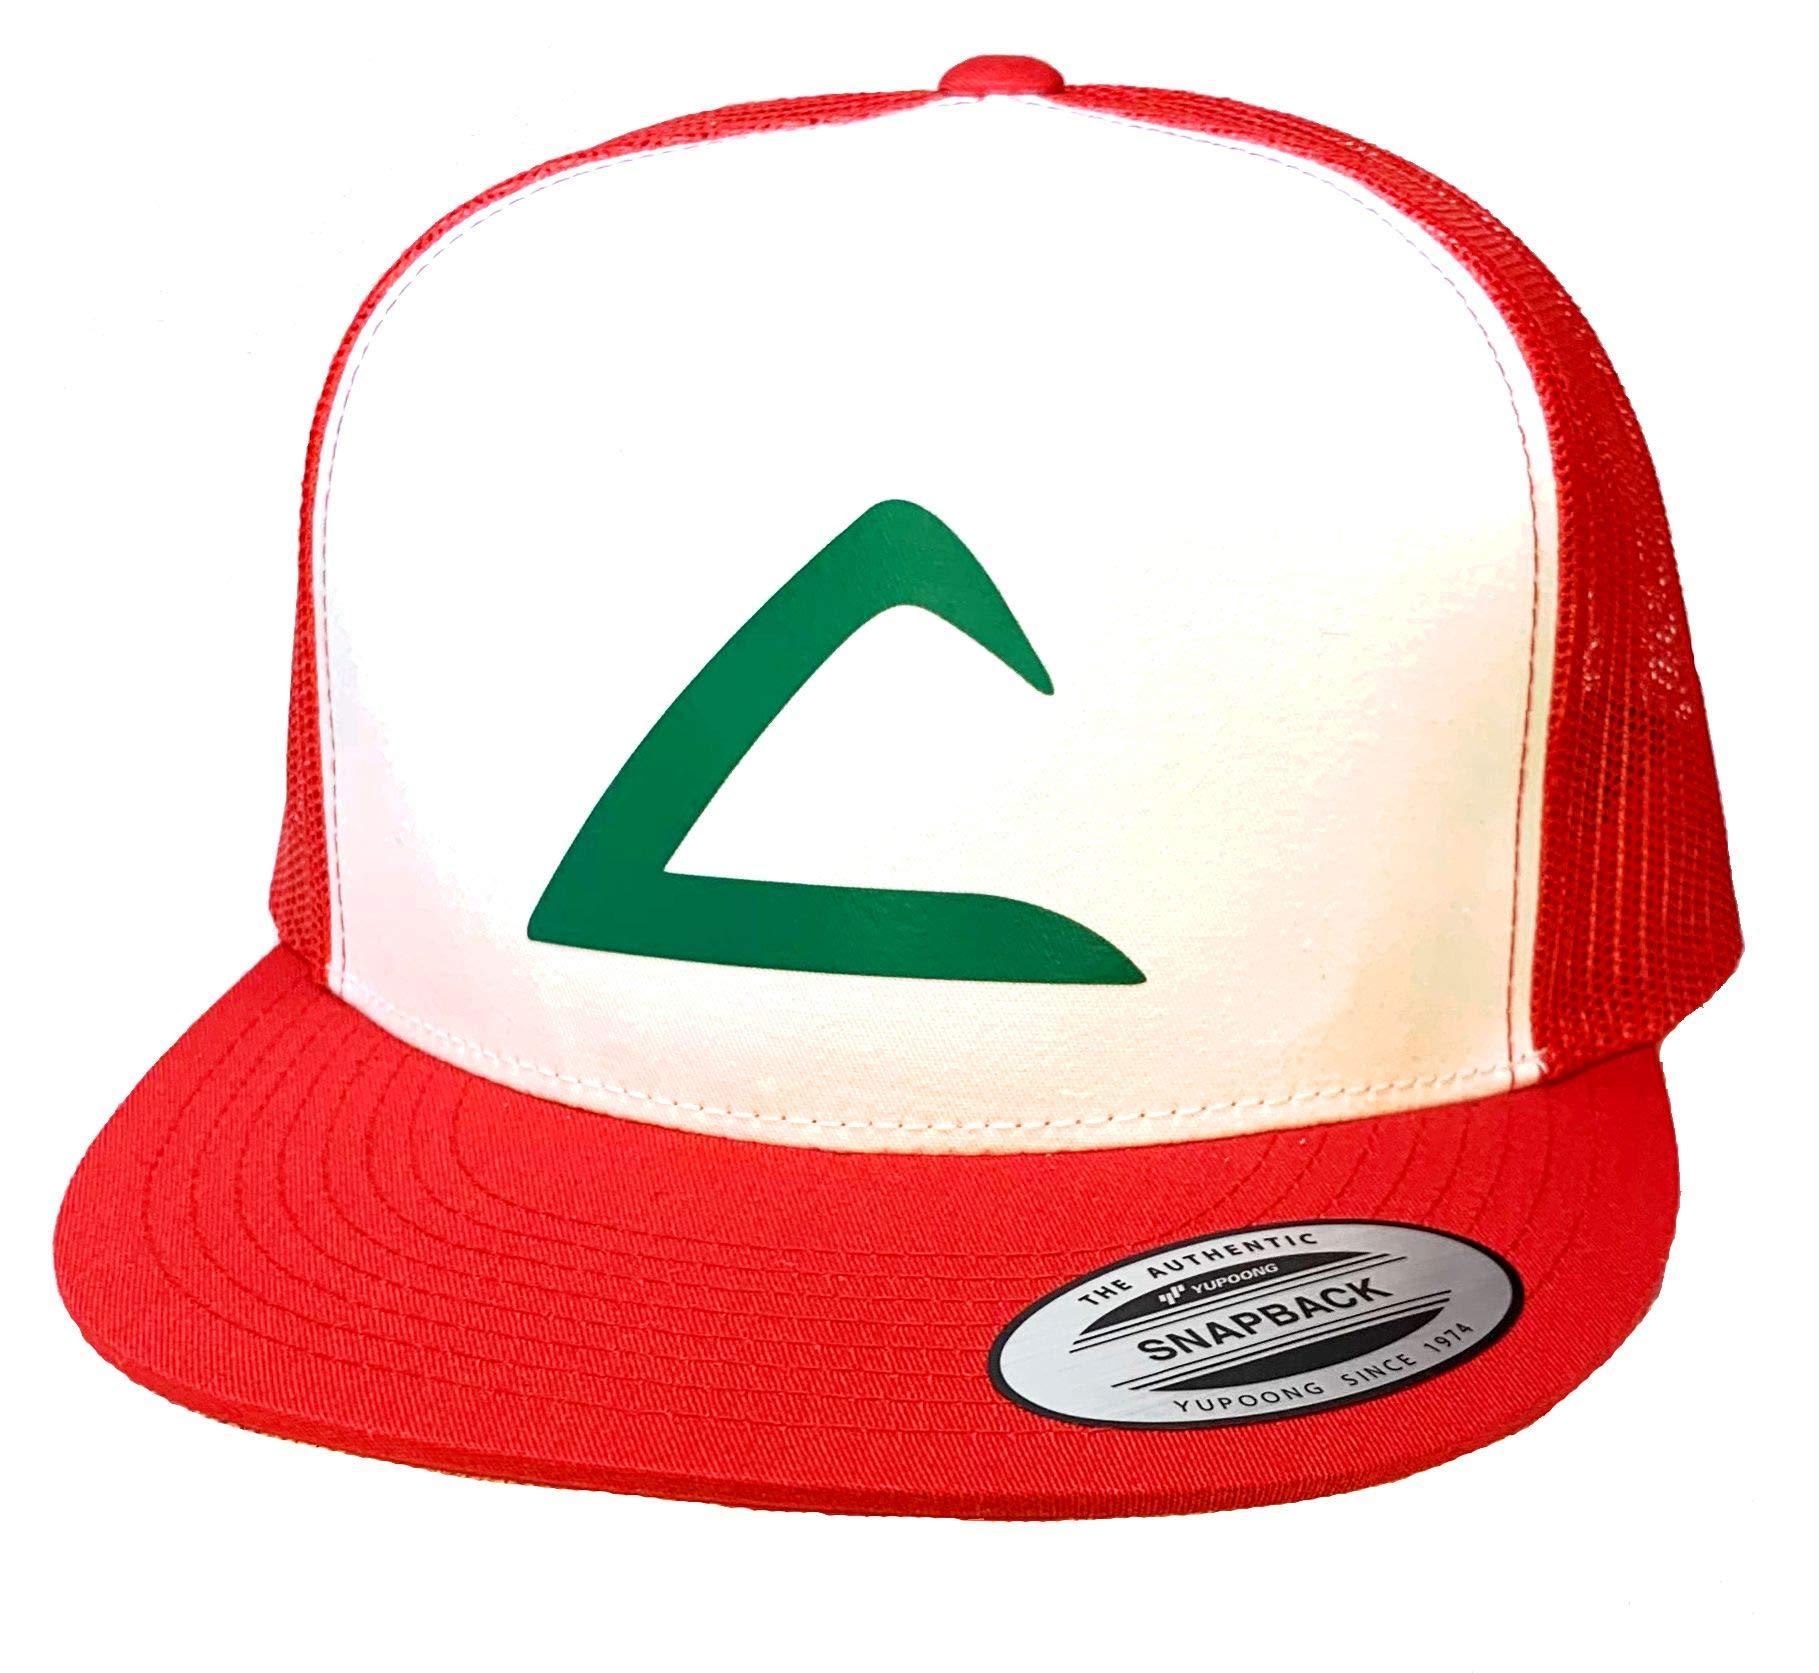 Flat Bill Ash Ketchum Cosplay Hat Mesh Cap Snap Back - Adult Size Red